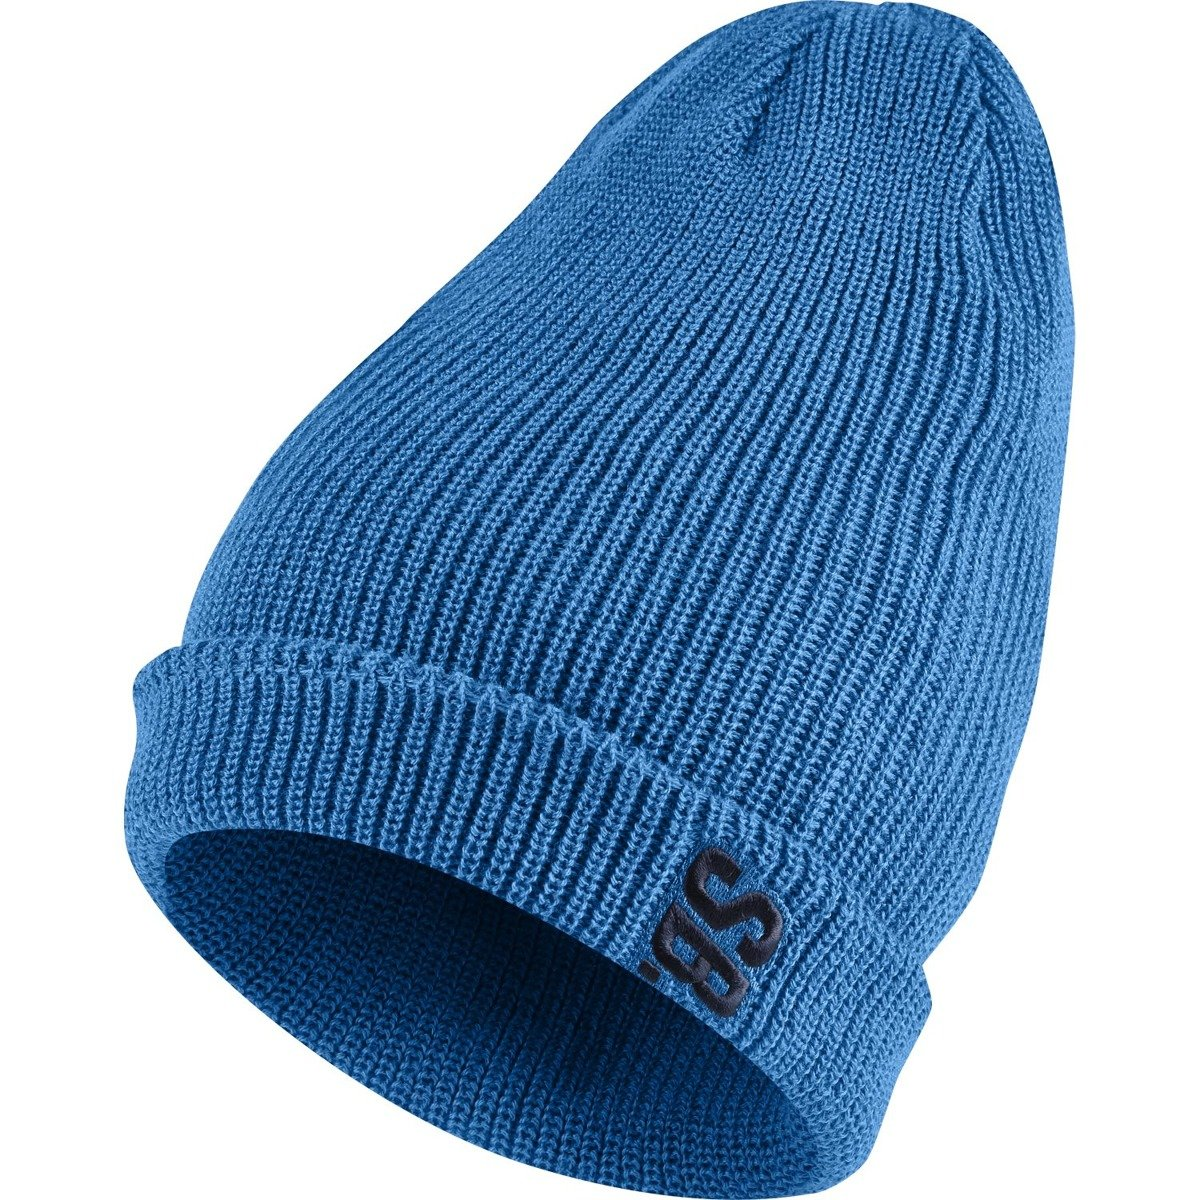 low priced a1cac eb256 Miniramp Skateshop czapka nike sb surplus beanie lt photo blue obsidian